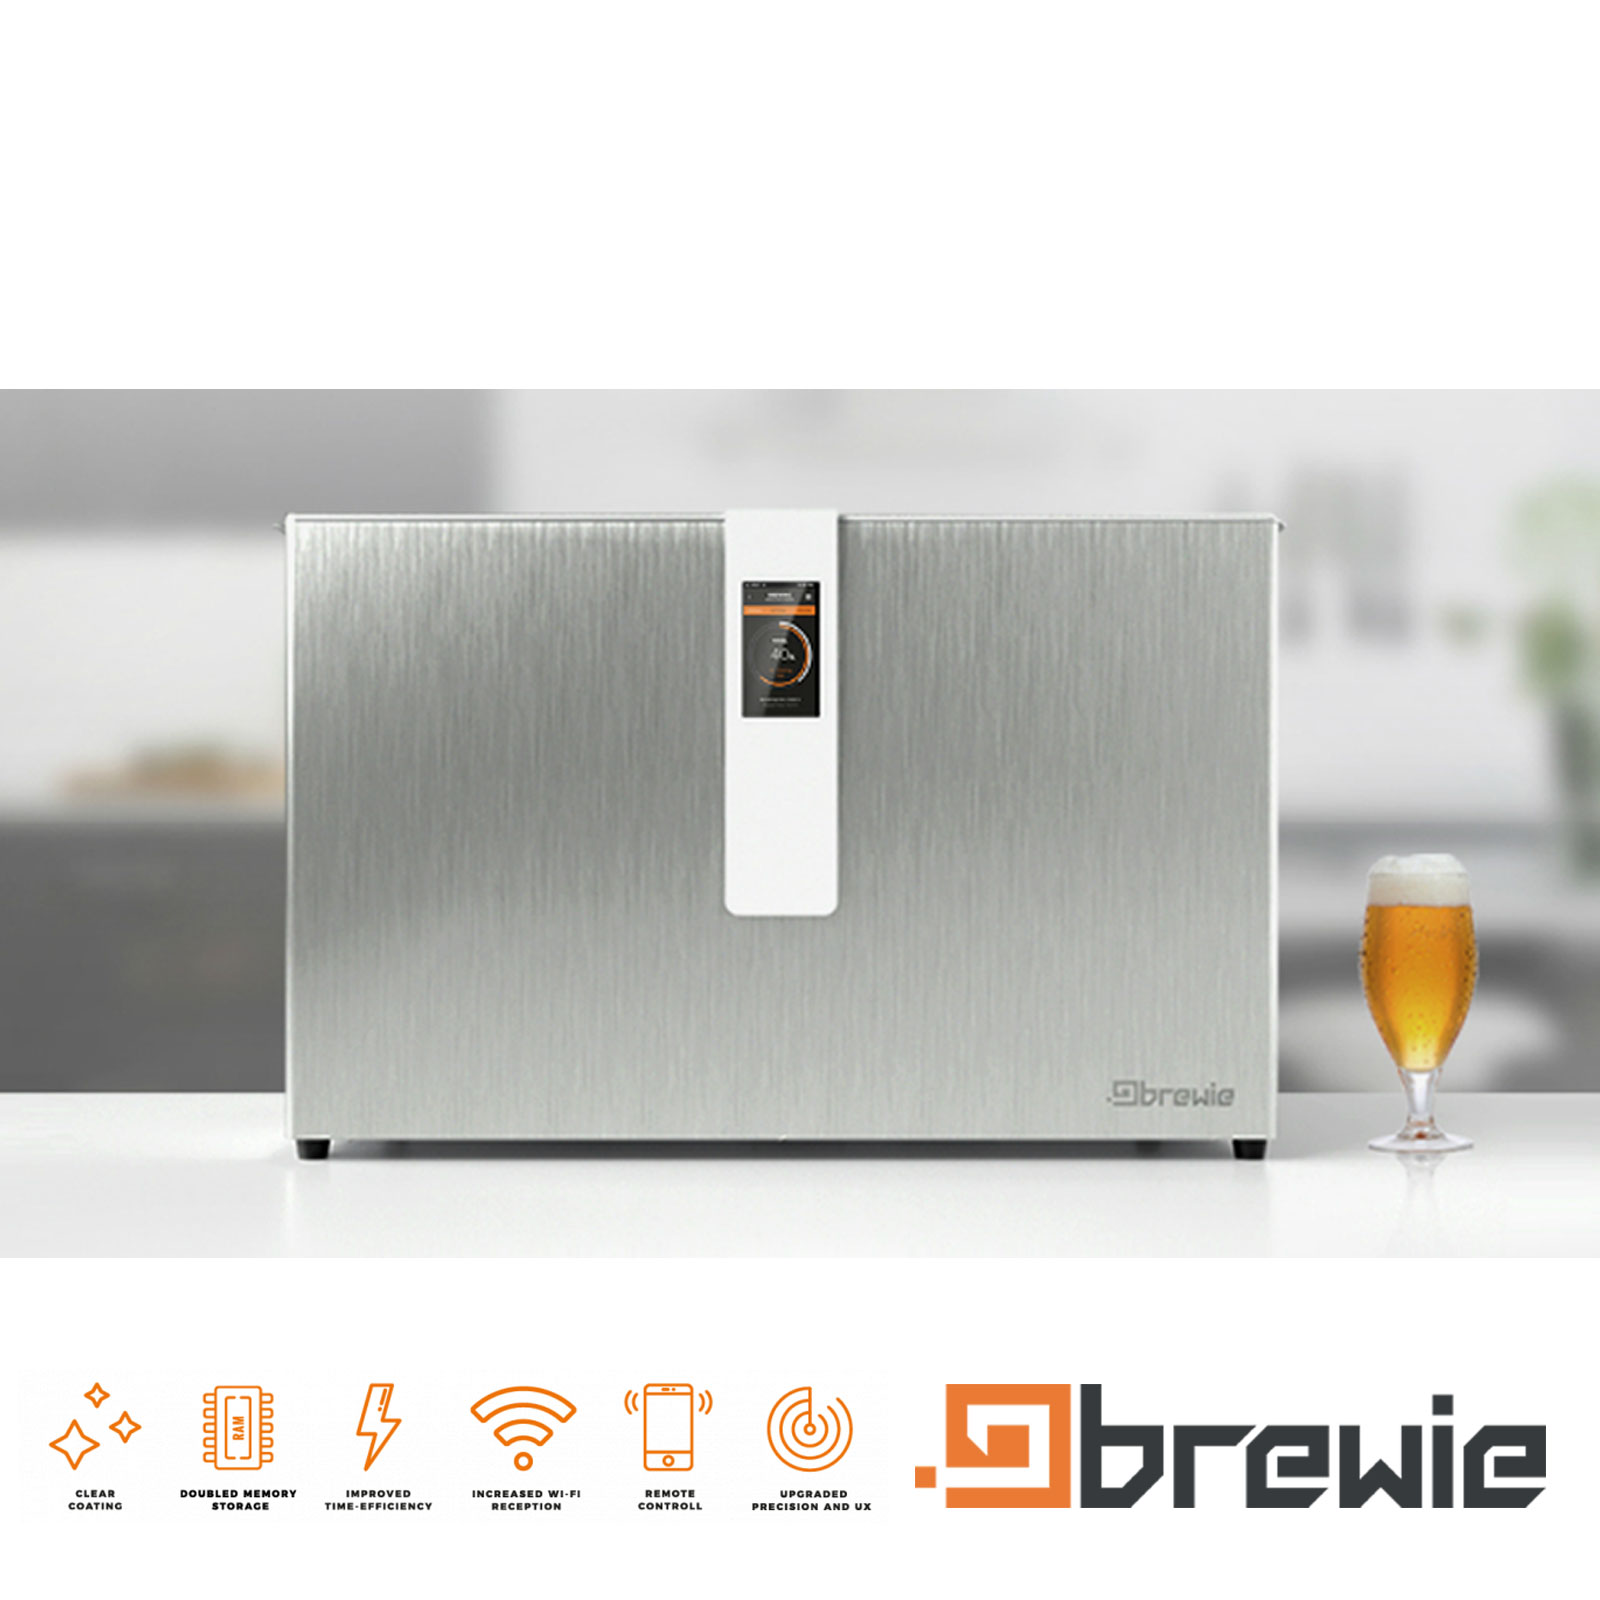 Impianto Brewie + All in one